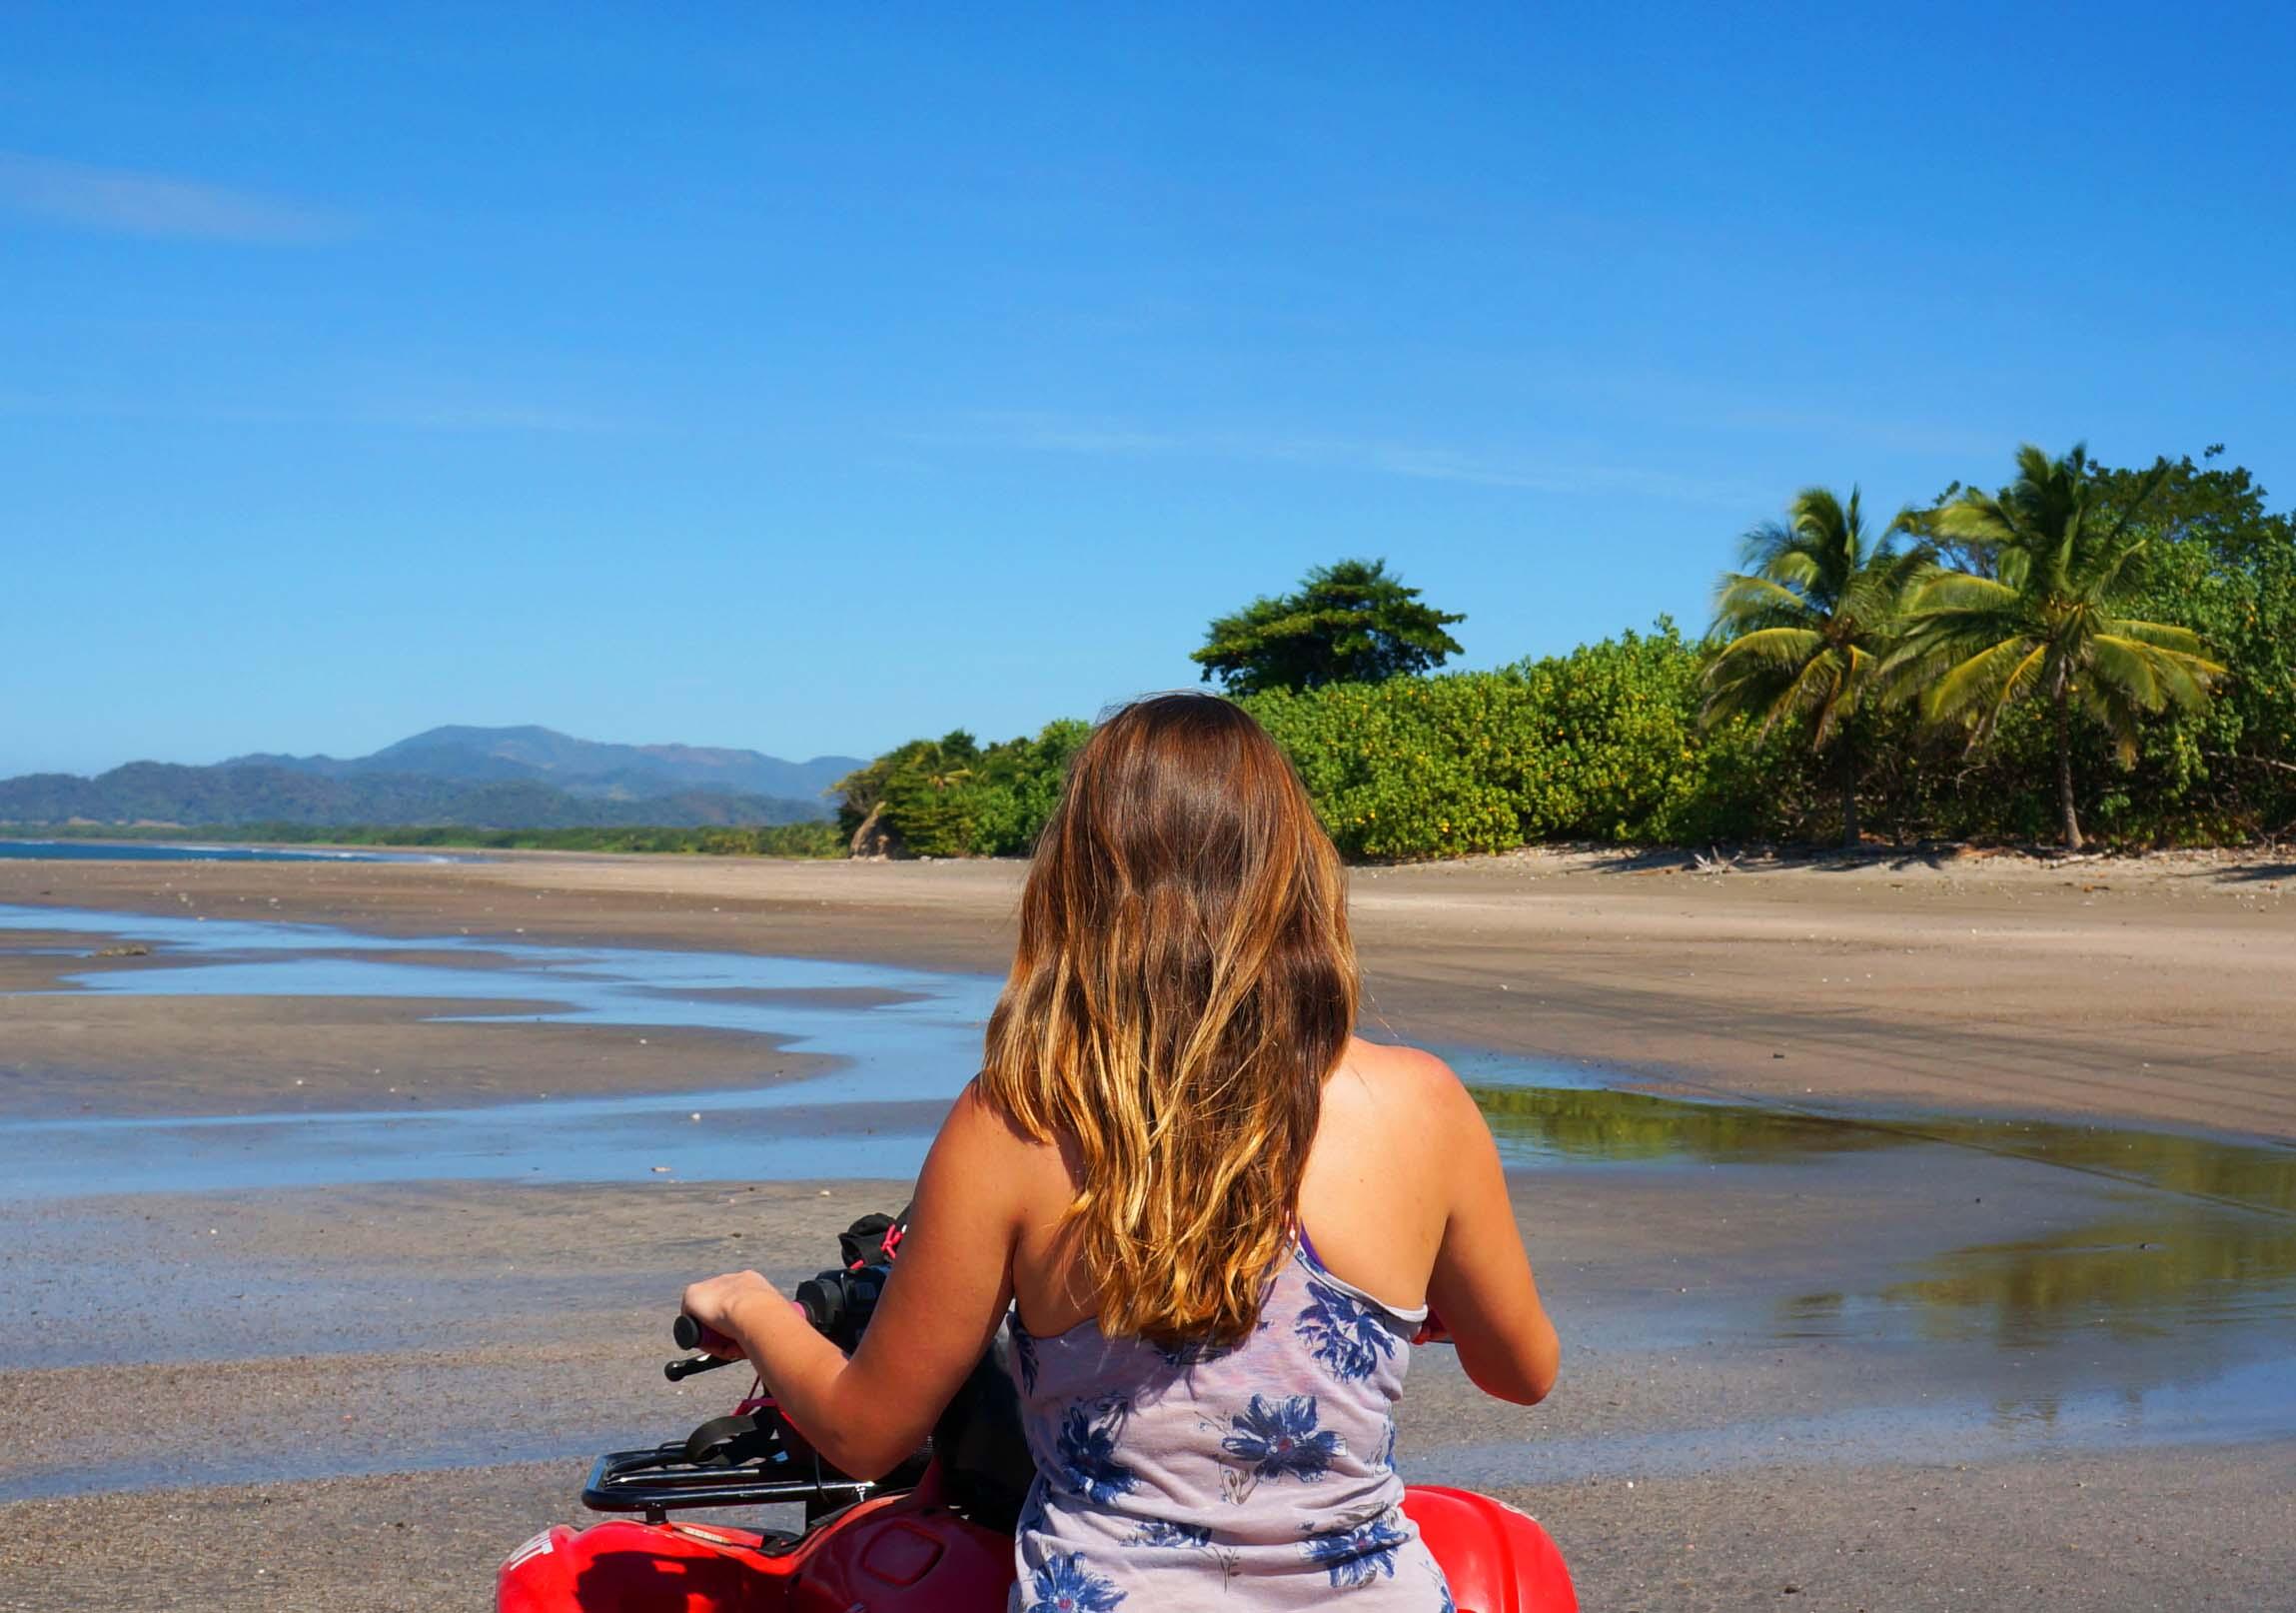 Beach Exploring With an ATV Rental in Santa Teresa, Costa Rica